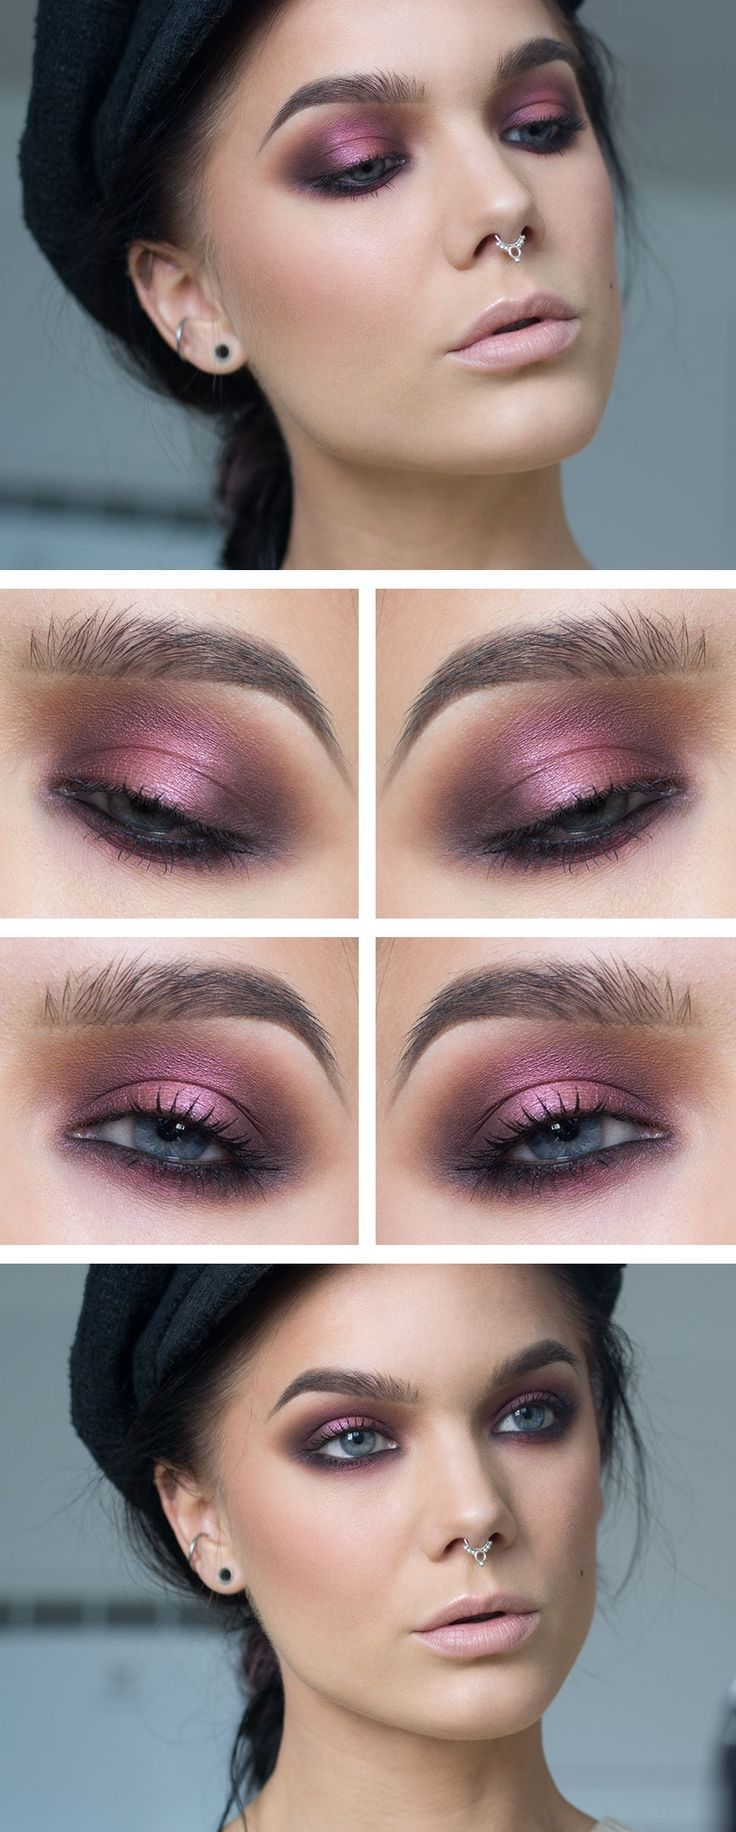 White dress eye makeup - White Dress Eye Makeup 58